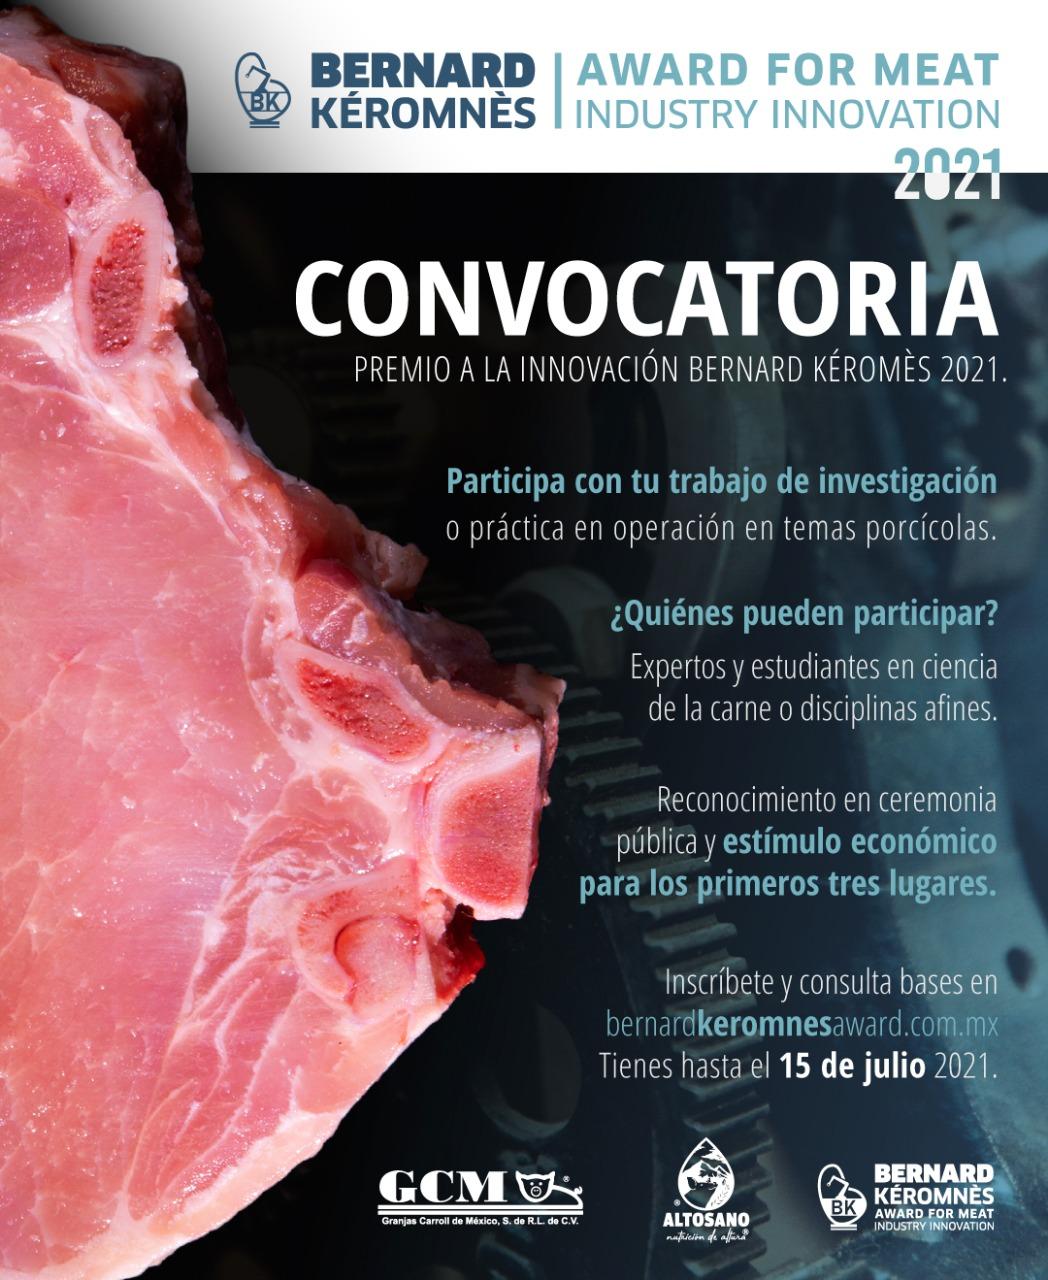 Vence plazo para participar en 2a edición del -Premio a la Innovación Bernard Kéromnès-: Carroll